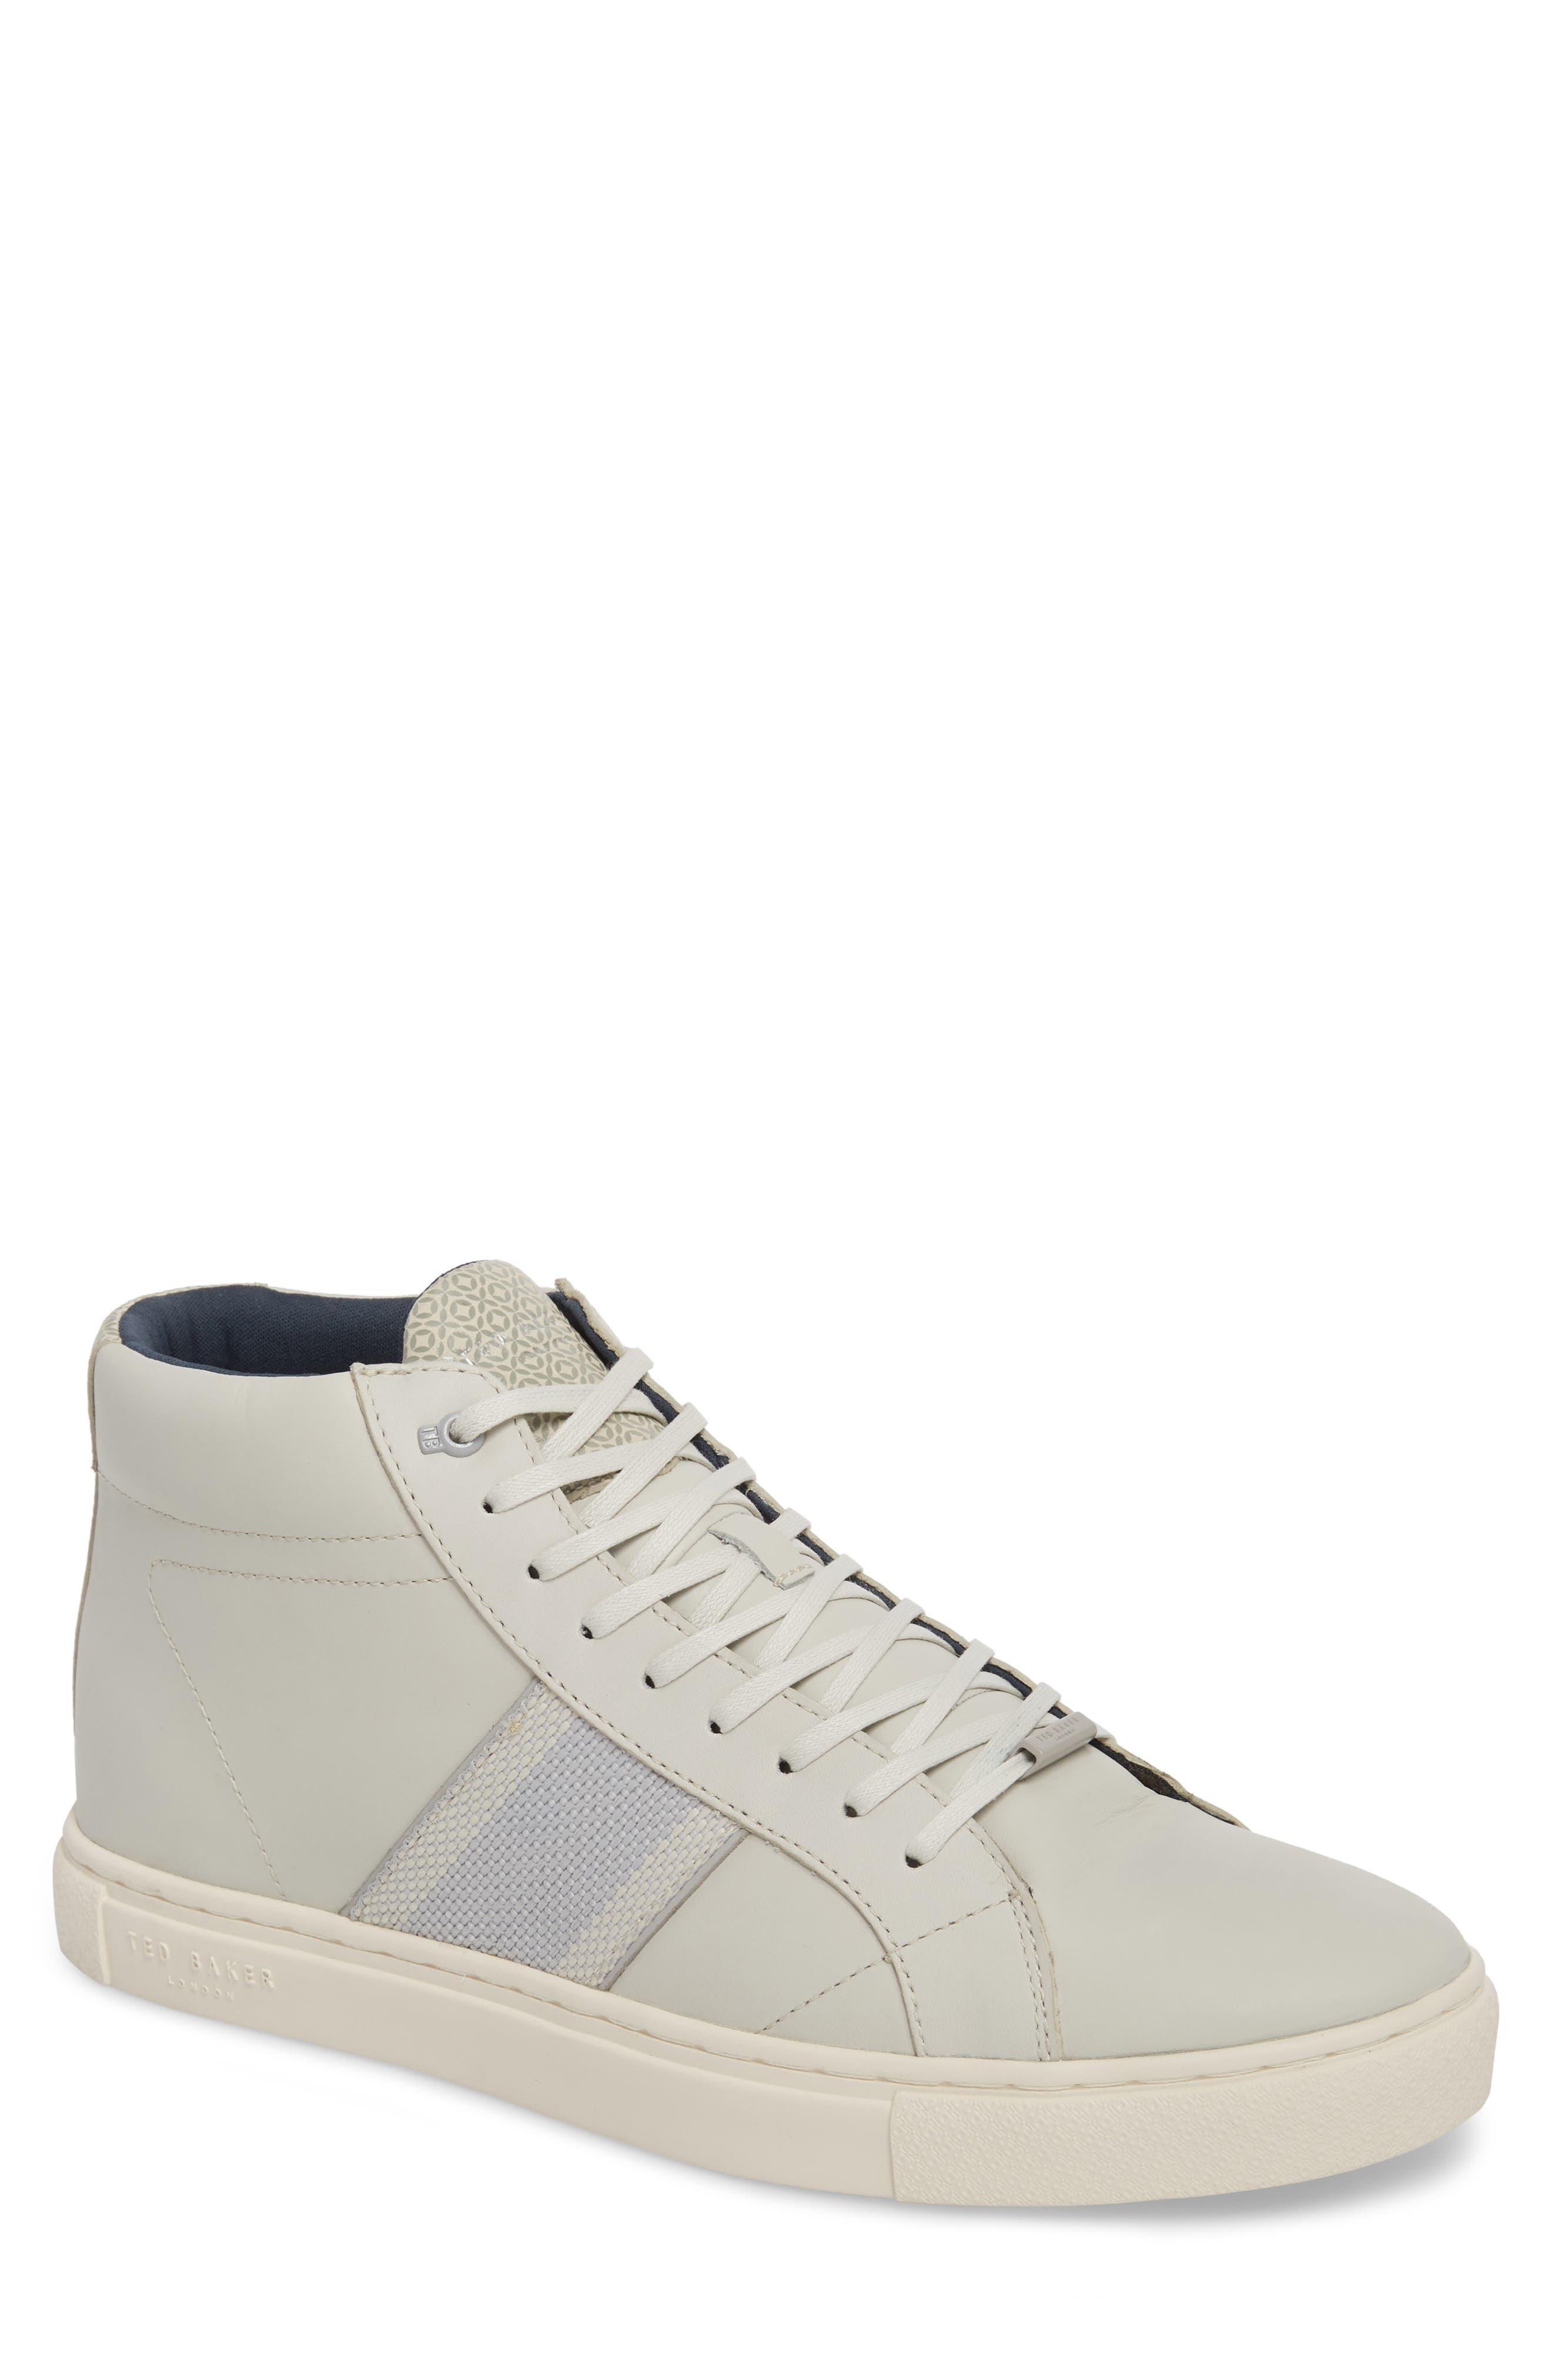 Cruuw High Top Sneaker,                         Main,                         color, 152